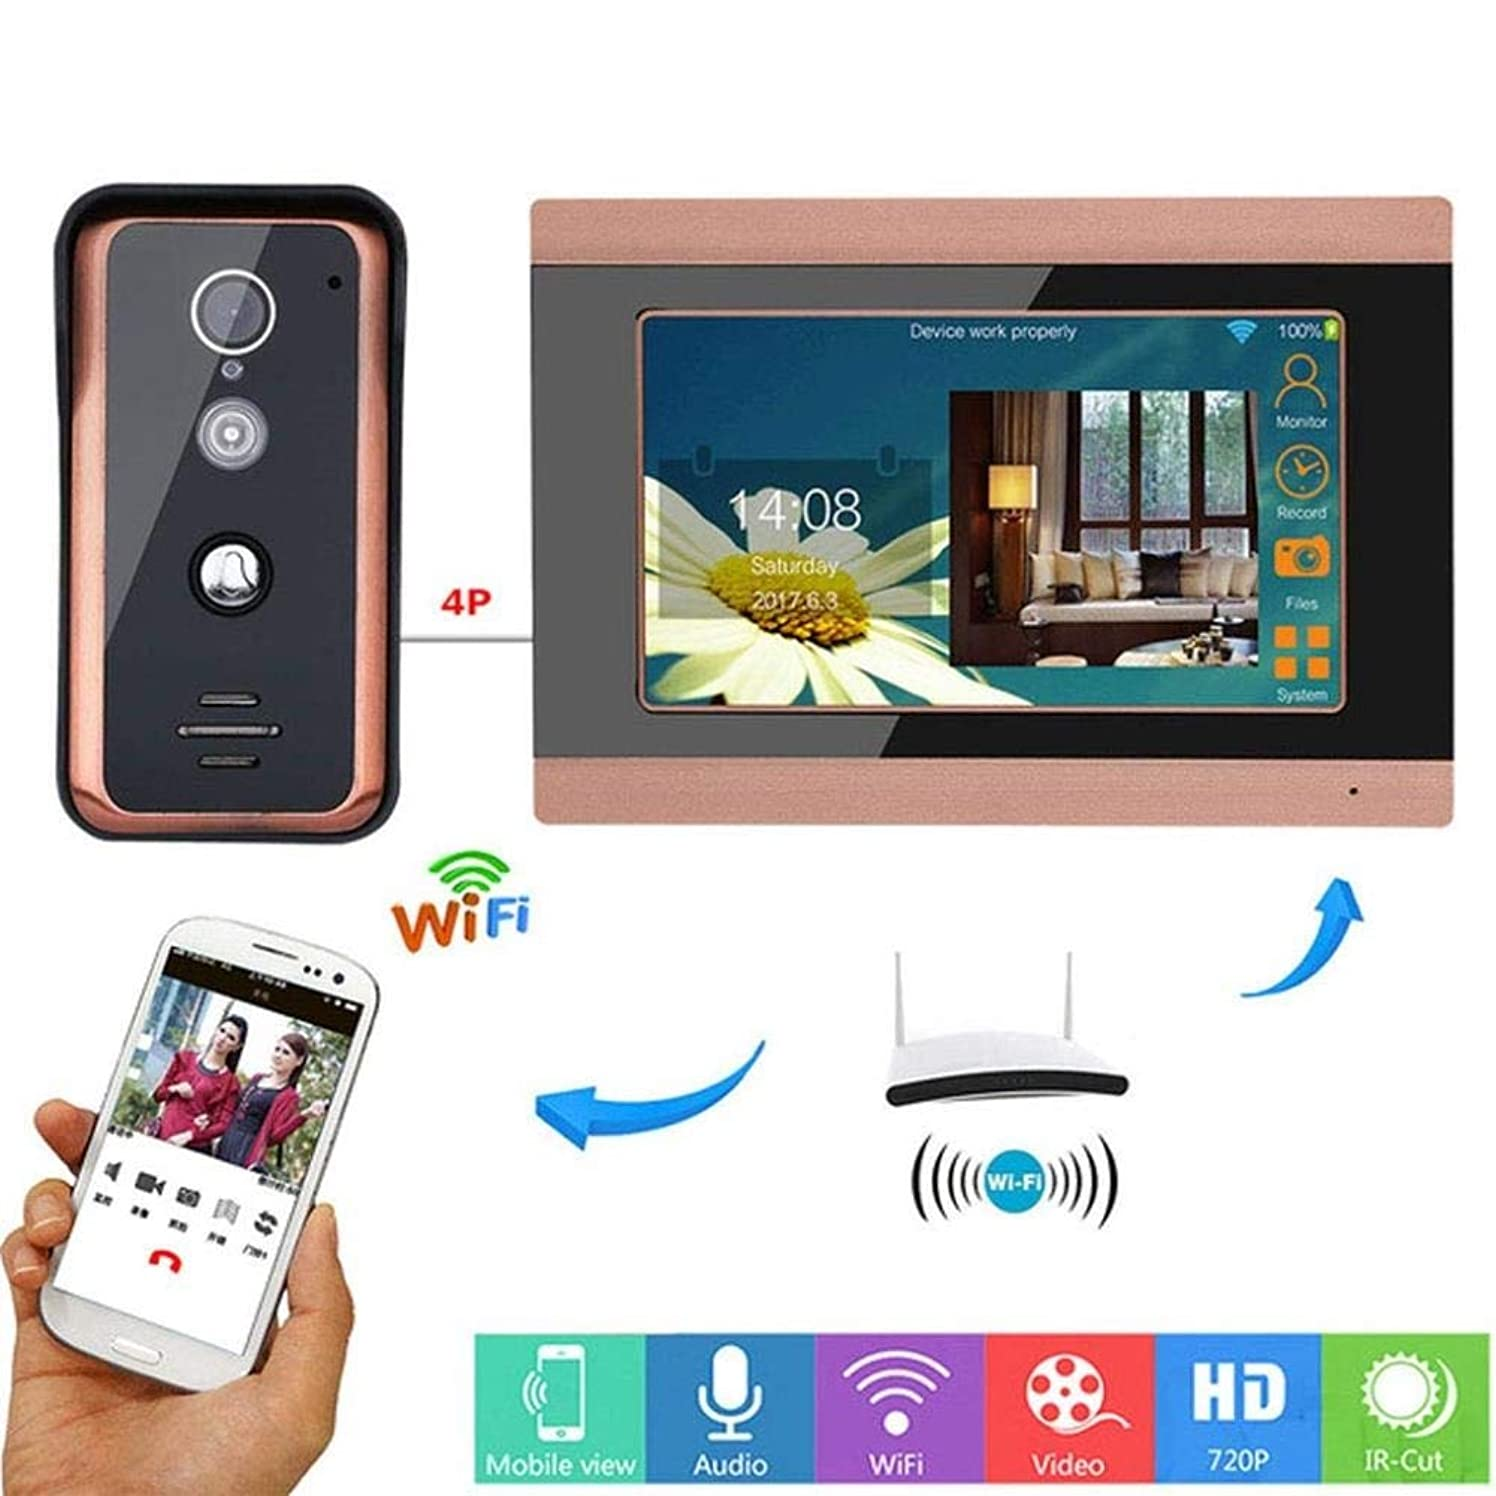 Futursd Ring Video Doorbell, Wired WiFi Video Intercom Doorbell Remote Intercom Camera Video Unlock Home Security Monitoring System